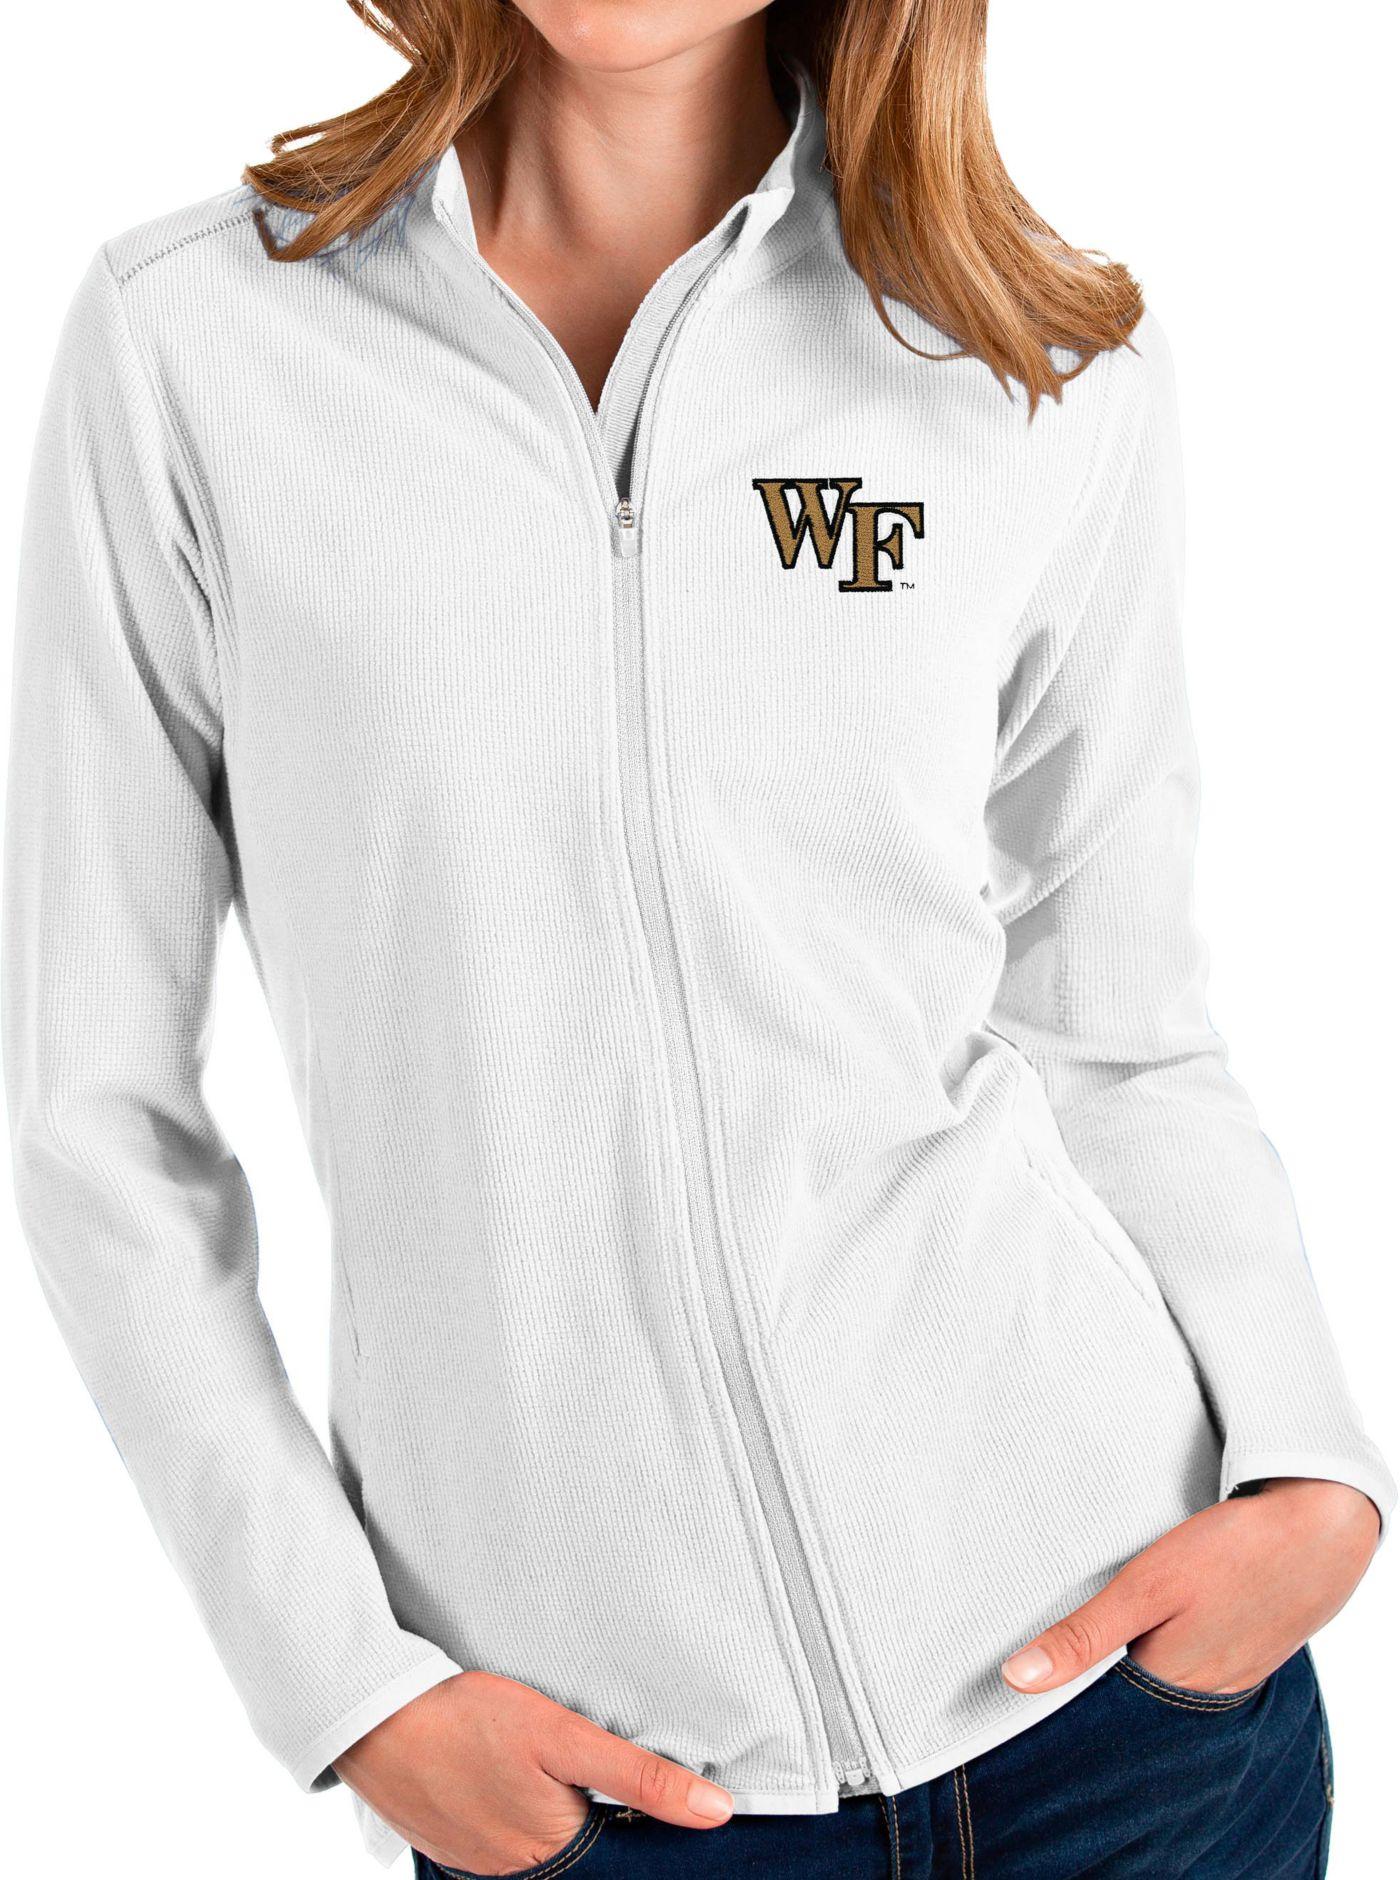 Antigua Women's Wake Forest Demon Deacons Glacier Full-Zip White Jacket